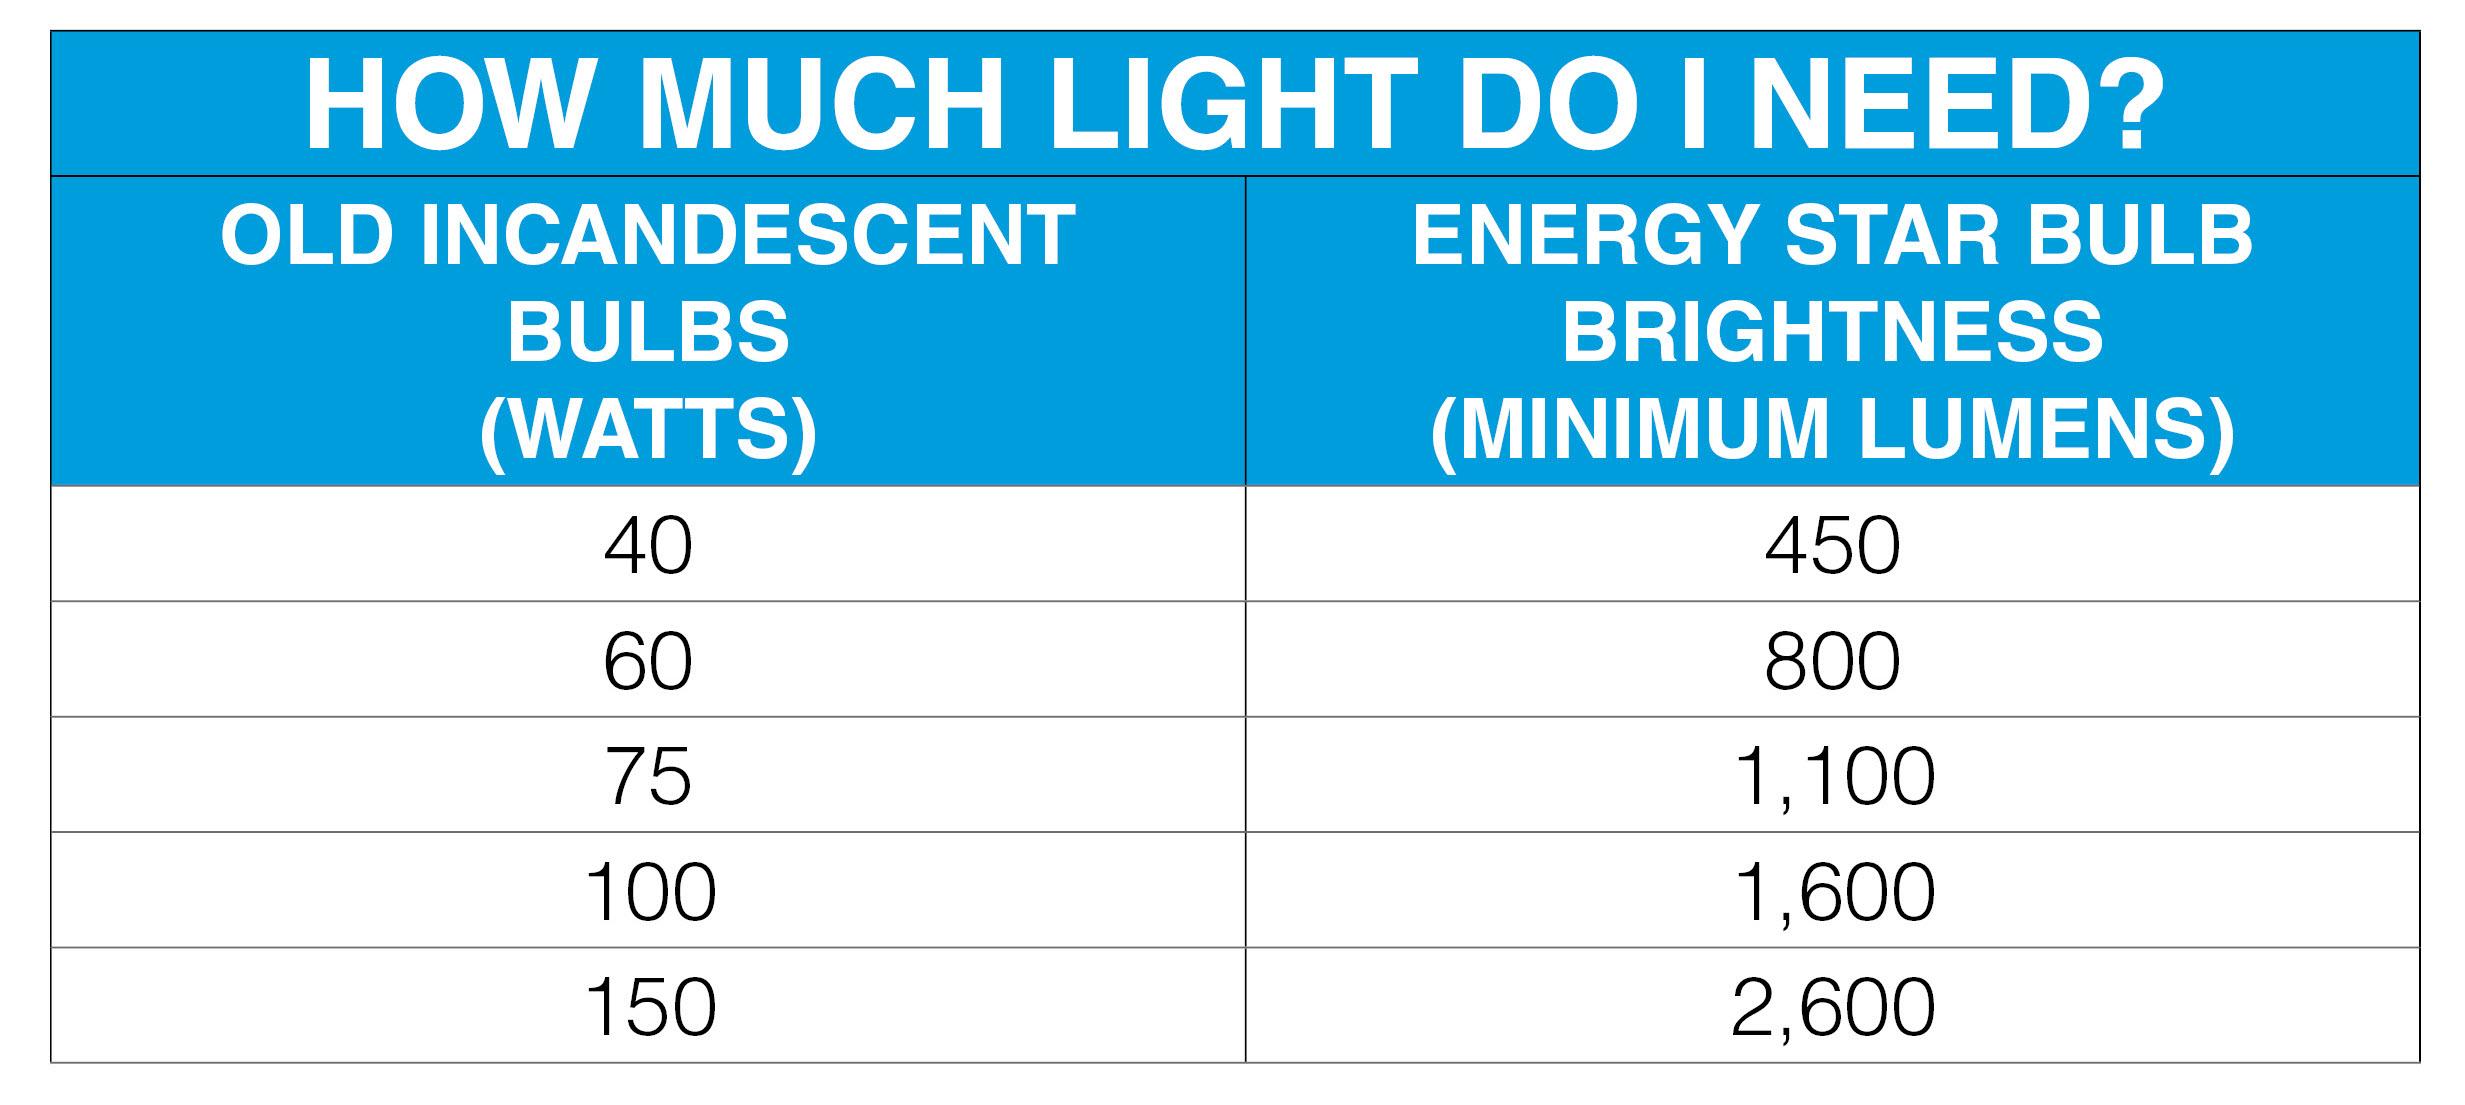 Cfl Light Bulbs 100 Watt